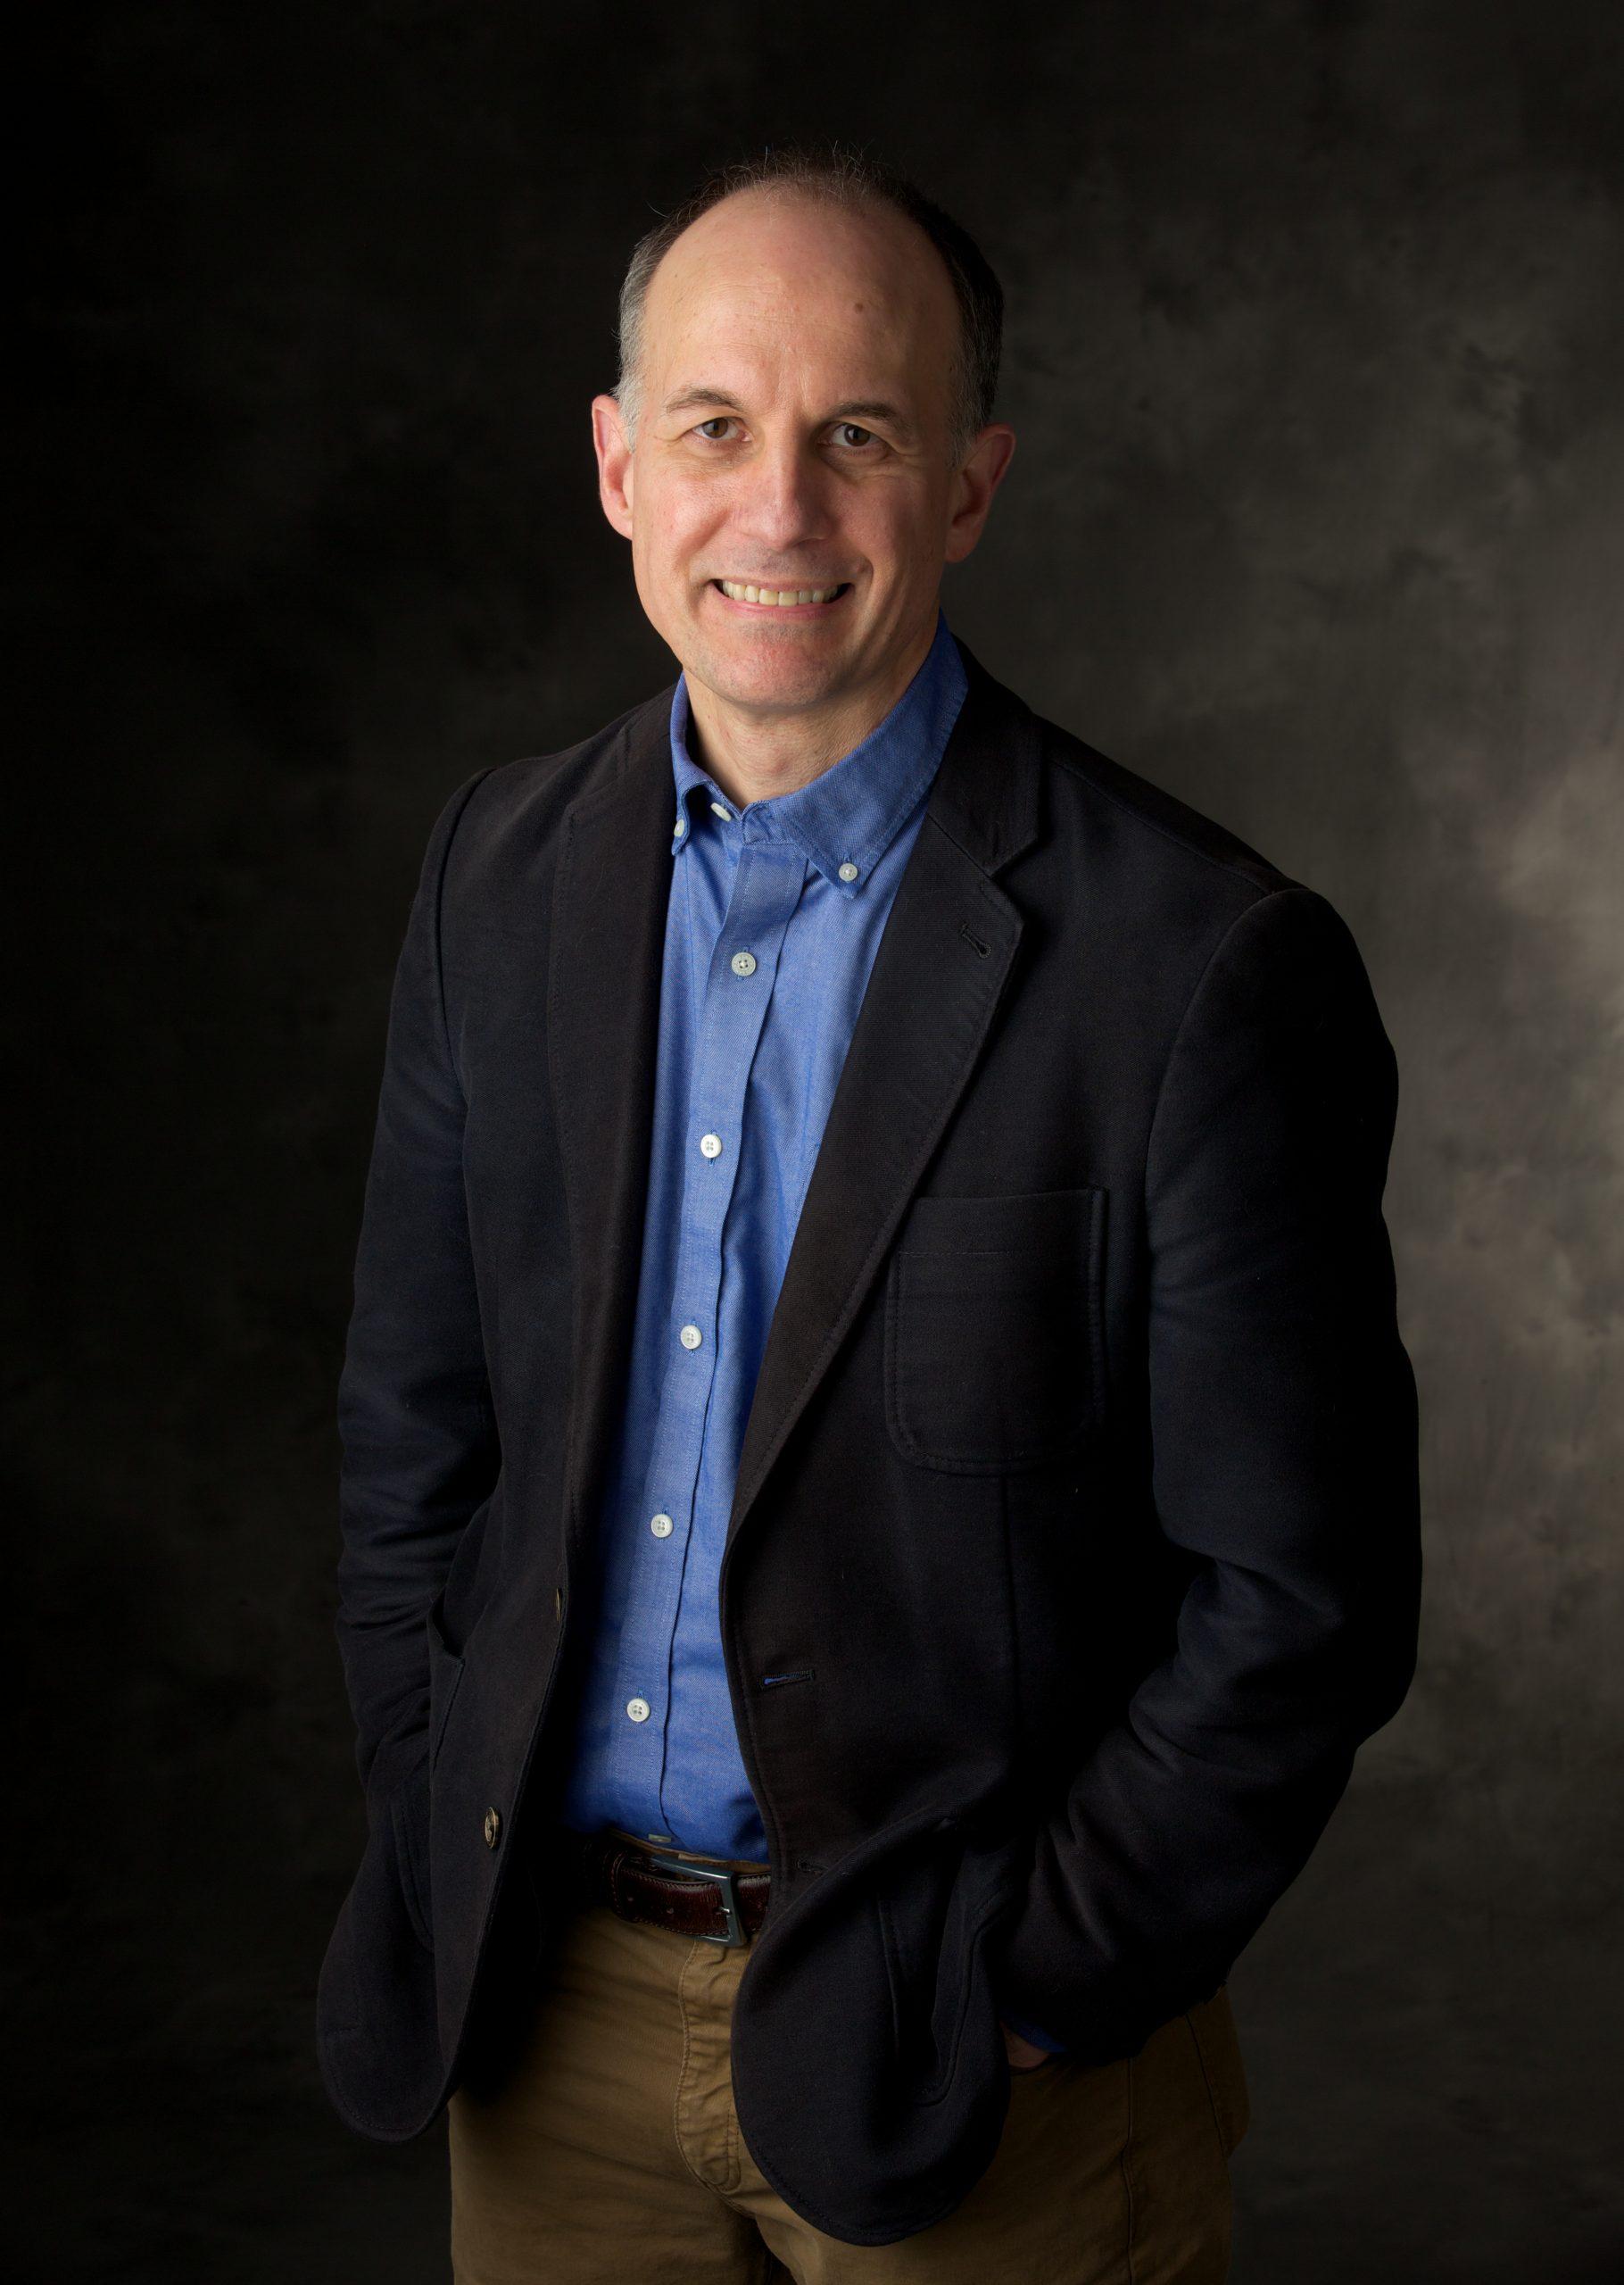 Christopher Swann